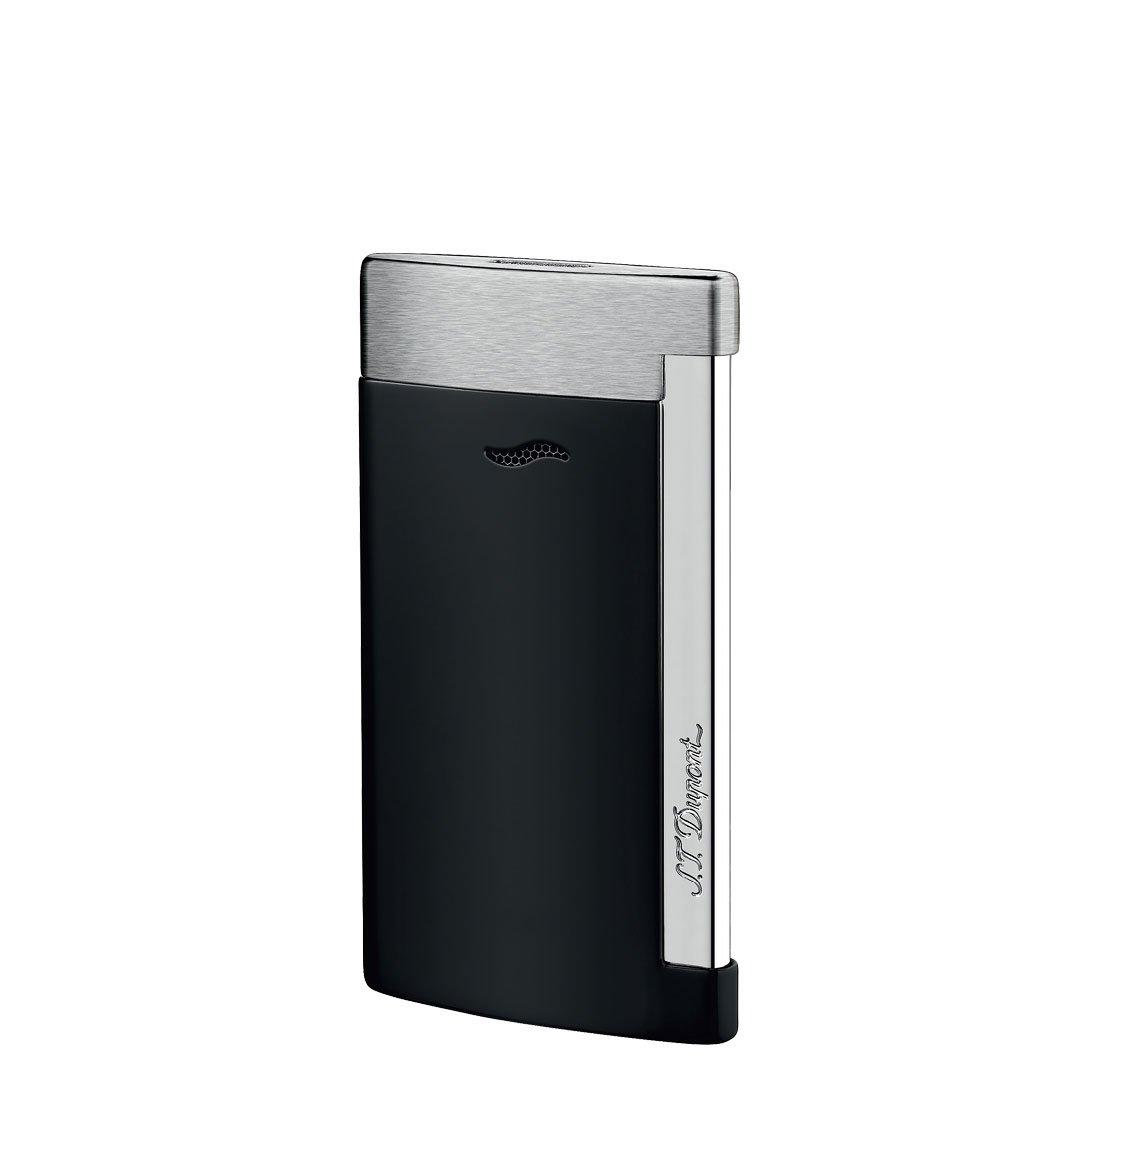 S.T. Dupont Αναπτήρας Slim 7 Mat Black And Brushed Chrome Lighter